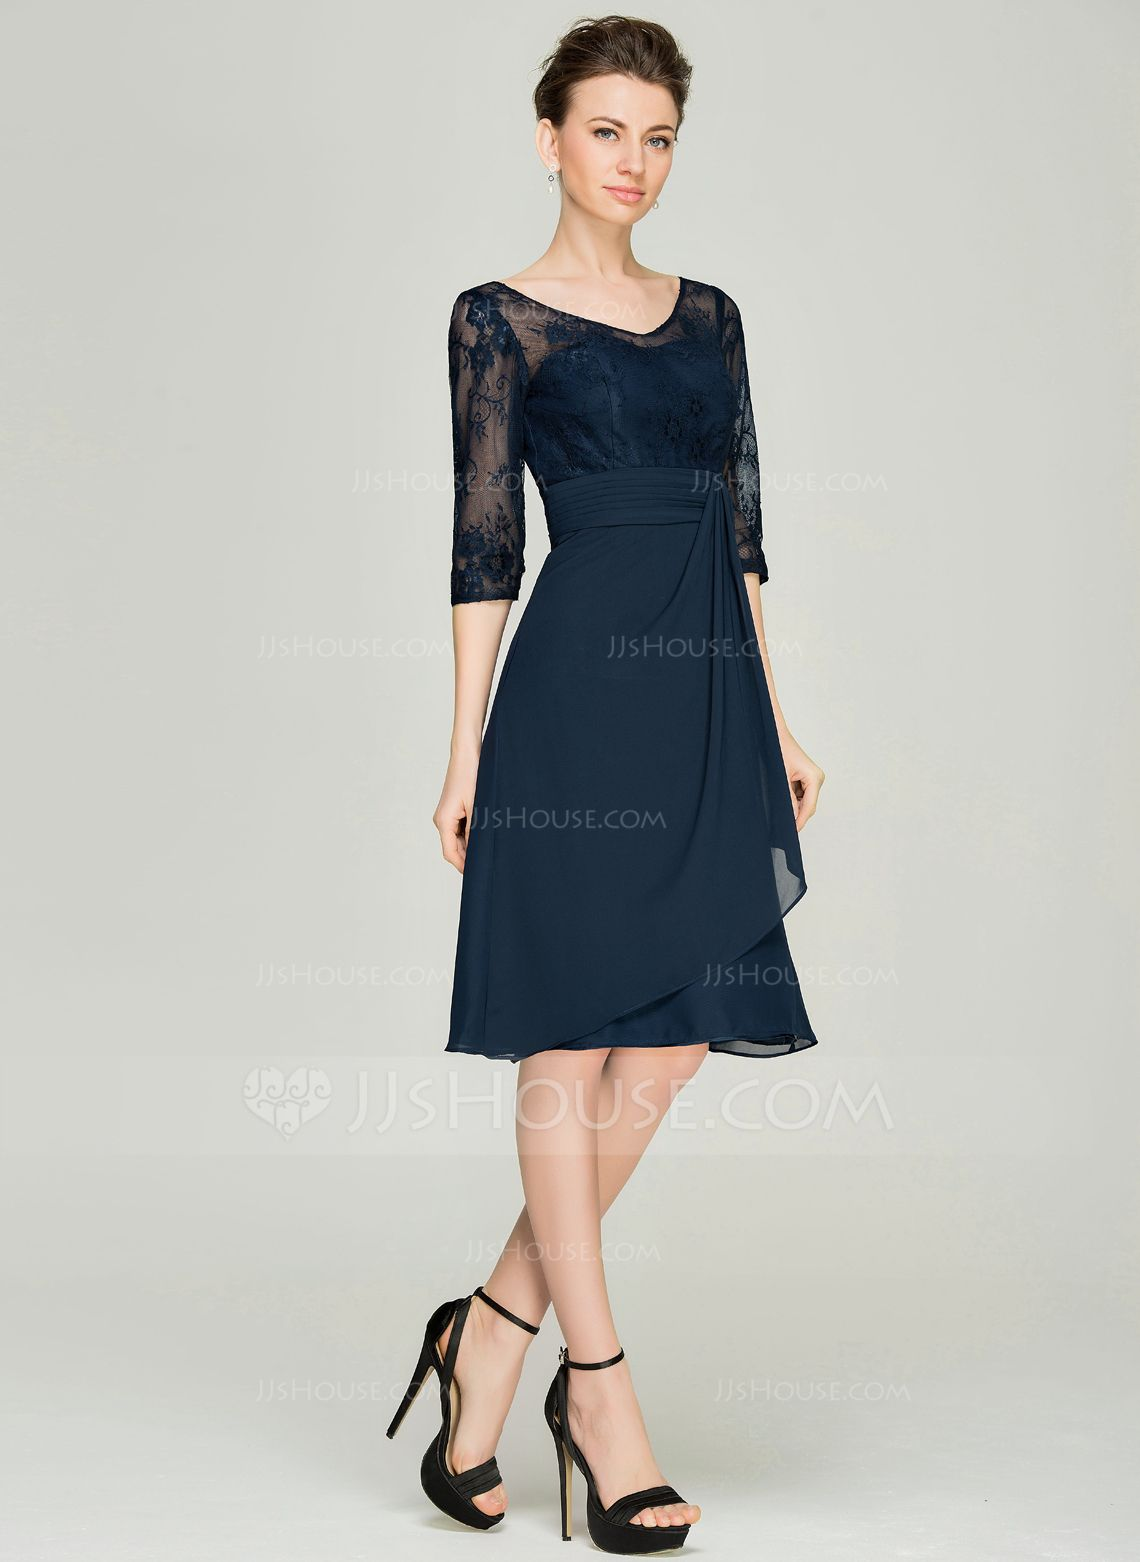 e609f390bc566c A-Line/Princess V-neck Knee-Length Chiffon Lace Mother of the Bride Dress  With Cascading Ruffles (008062577) - JJsHouse